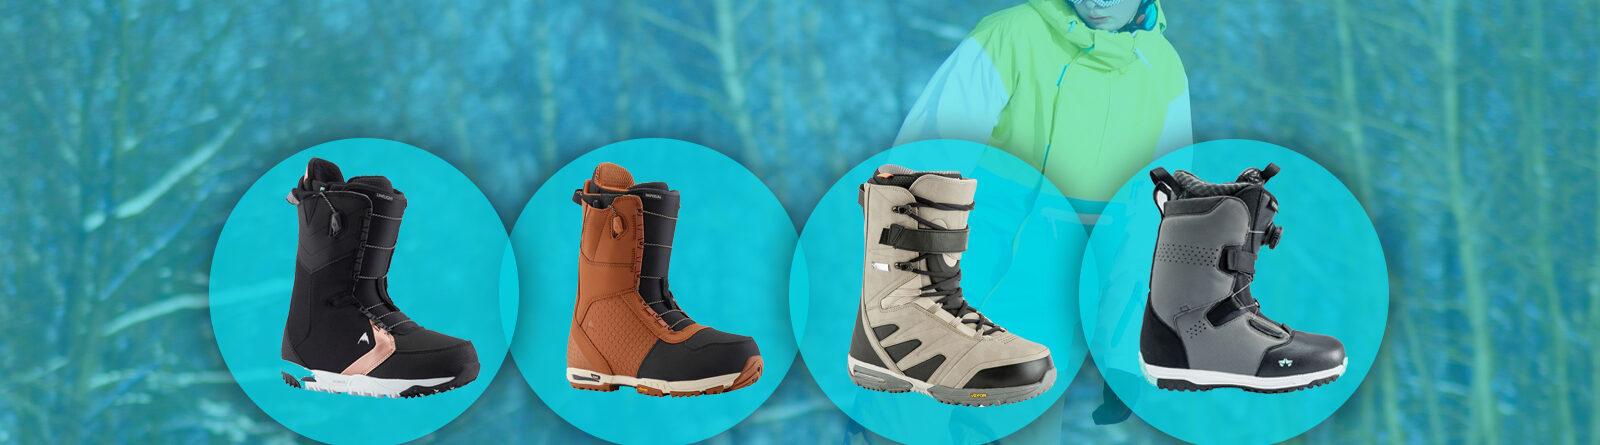 Best Freeride Snowboard Boots